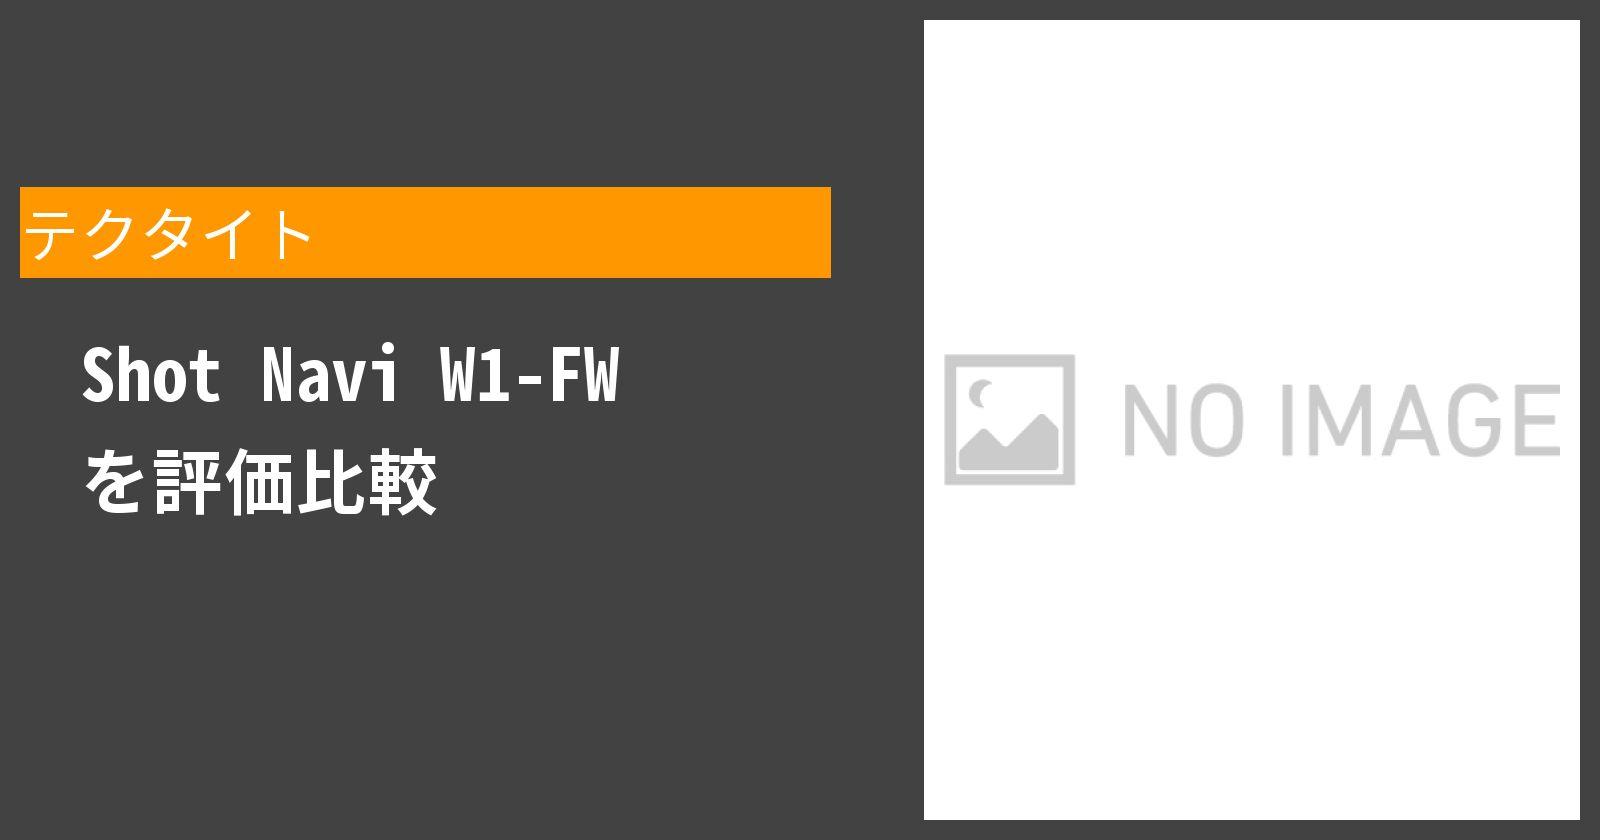 Shot Navi W1-FWを徹底評価